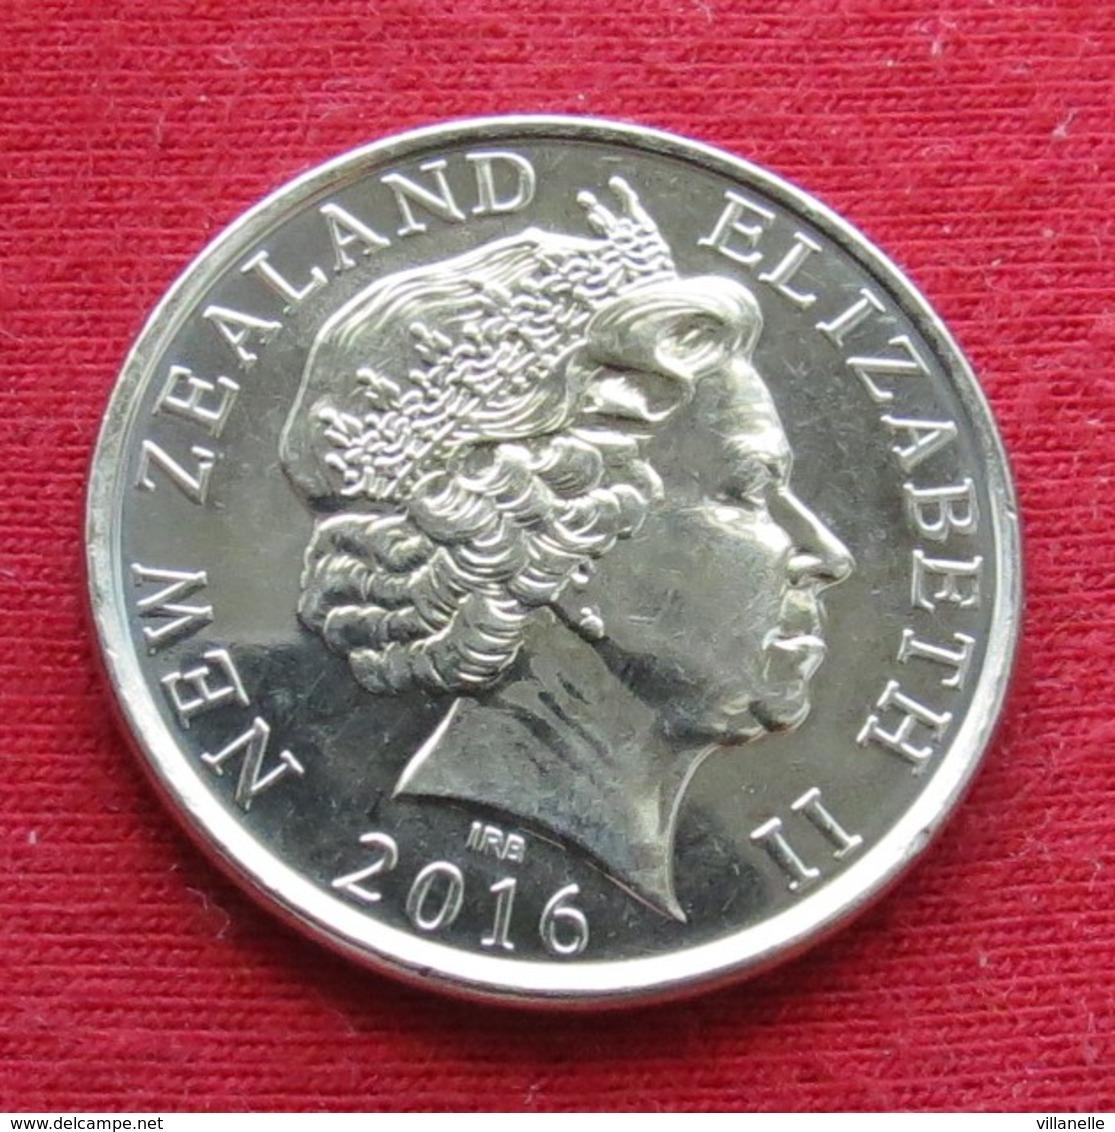 New Zealand 50 Cents 2016 Nova Zelandia Nuova Zelanda Nouvelle Zelande - New Zealand